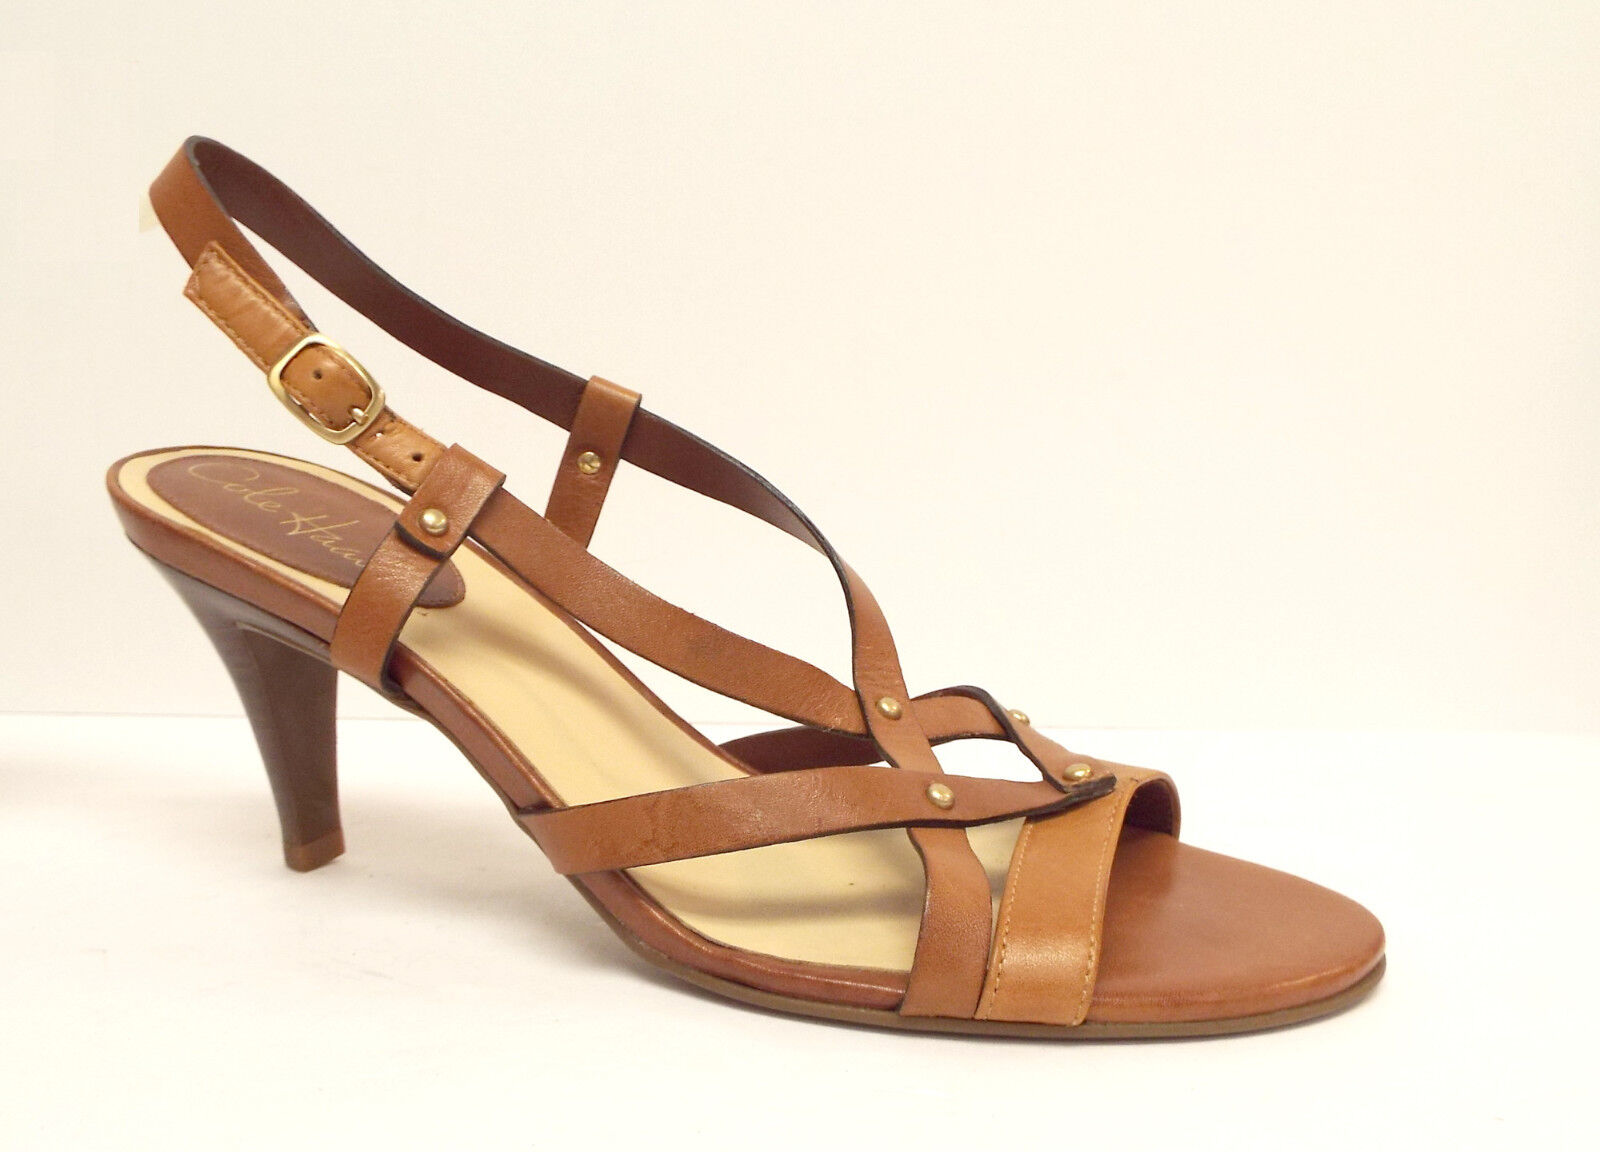 COLE Braun HAAN Größe 9 Tan Braun COLE Natural Leder Sandales Heels Schuhes 5ce9f3